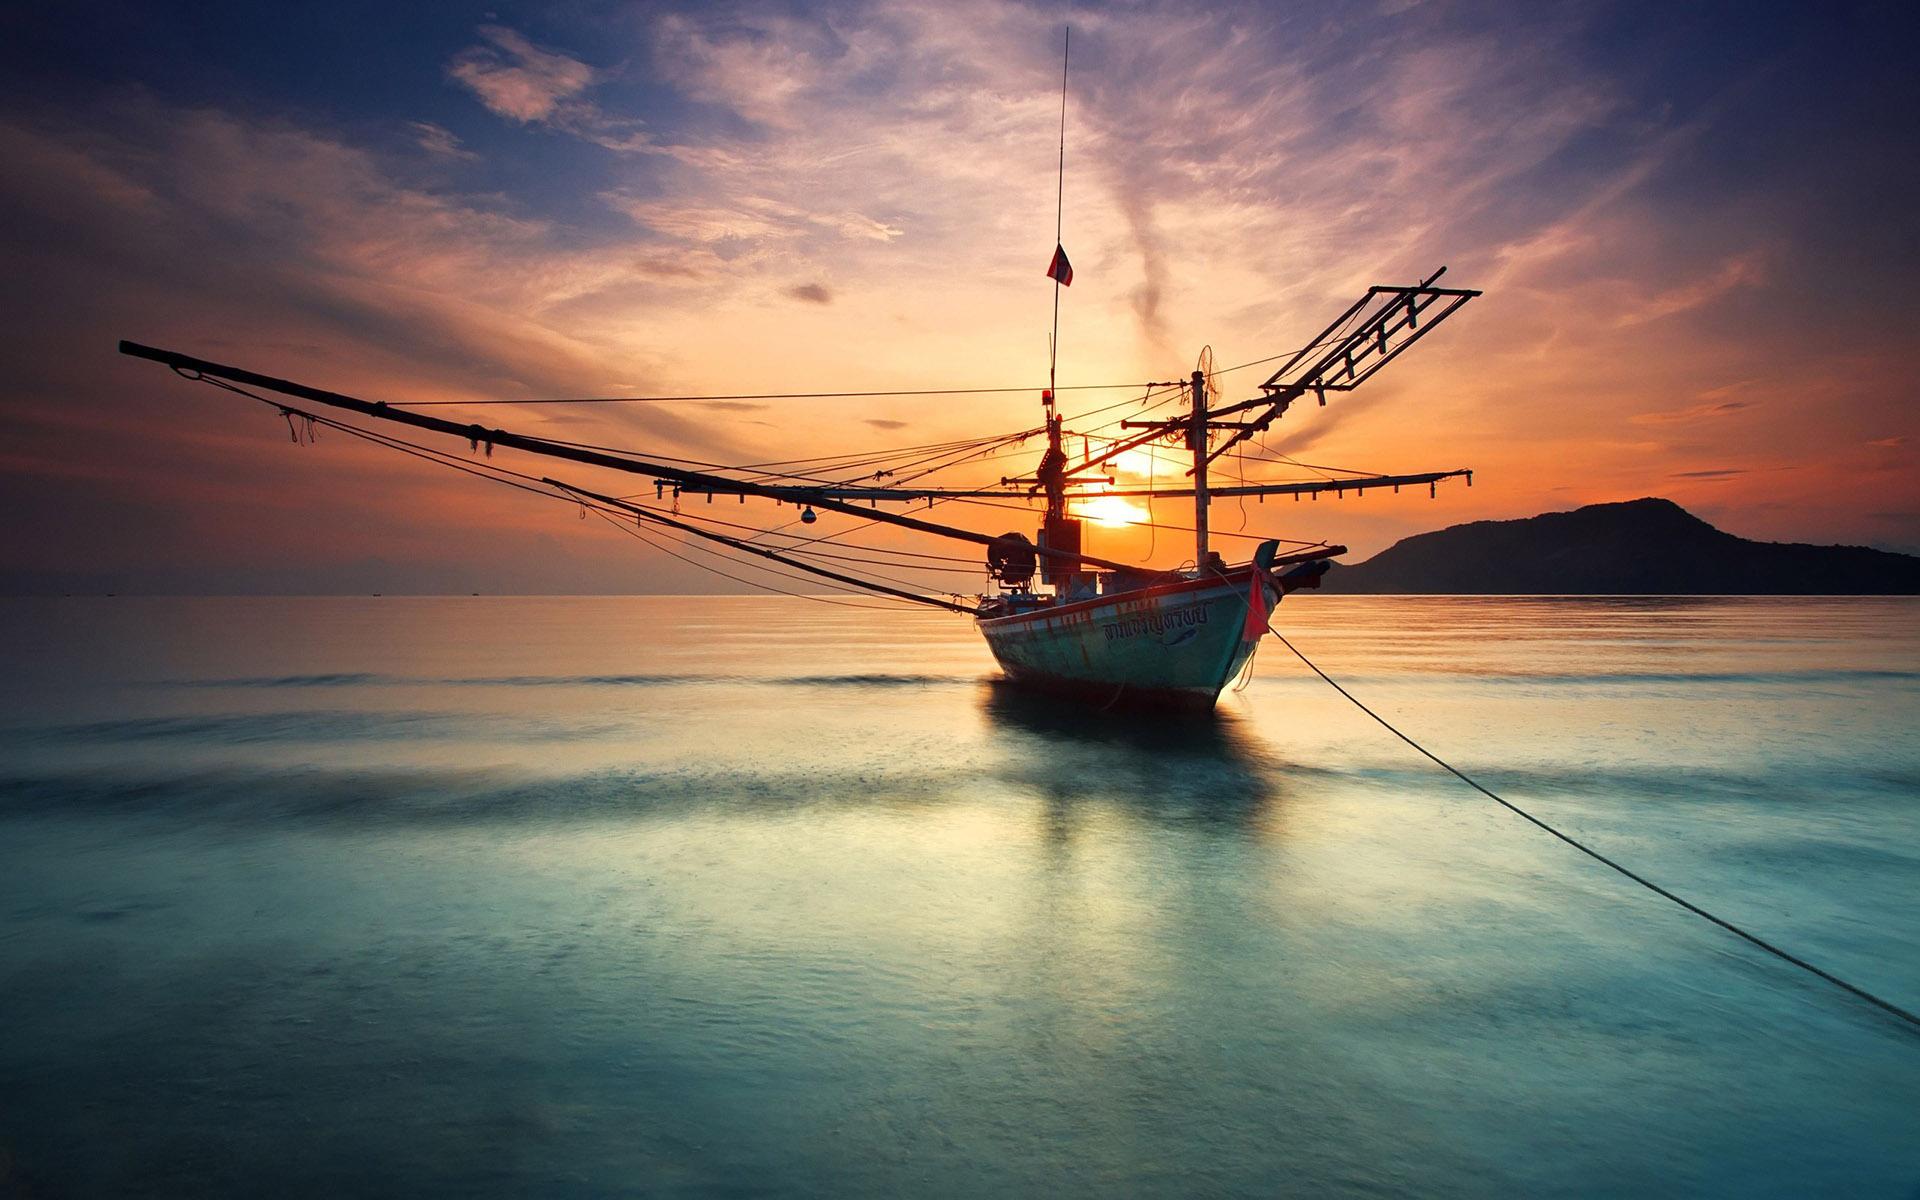 Summer Reflections Collections >> Boat Sunset Ocean wallpaper | 1920x1200 | 100505 | WallpaperUP